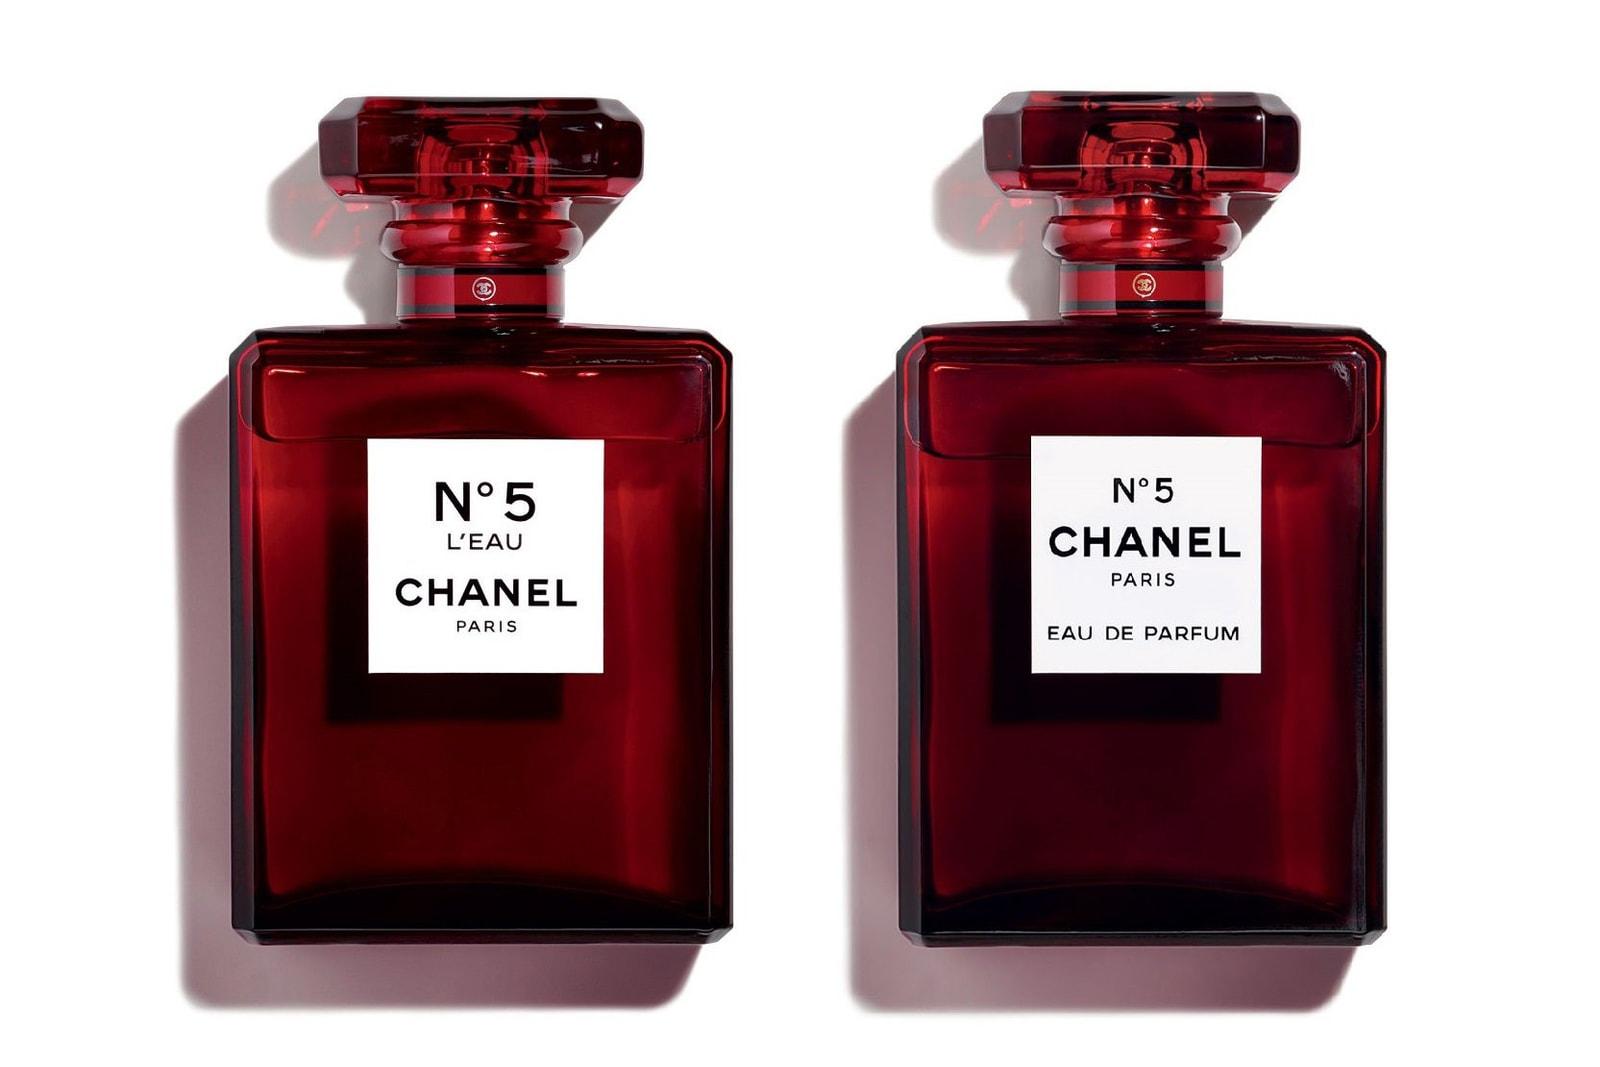 Grace Coddington Louis Vuitton Bag Speedy Red Chanel No 5 Perfume Fragrance Bottle Beauty Jorja Smith Nike Air Force 1 Sage High